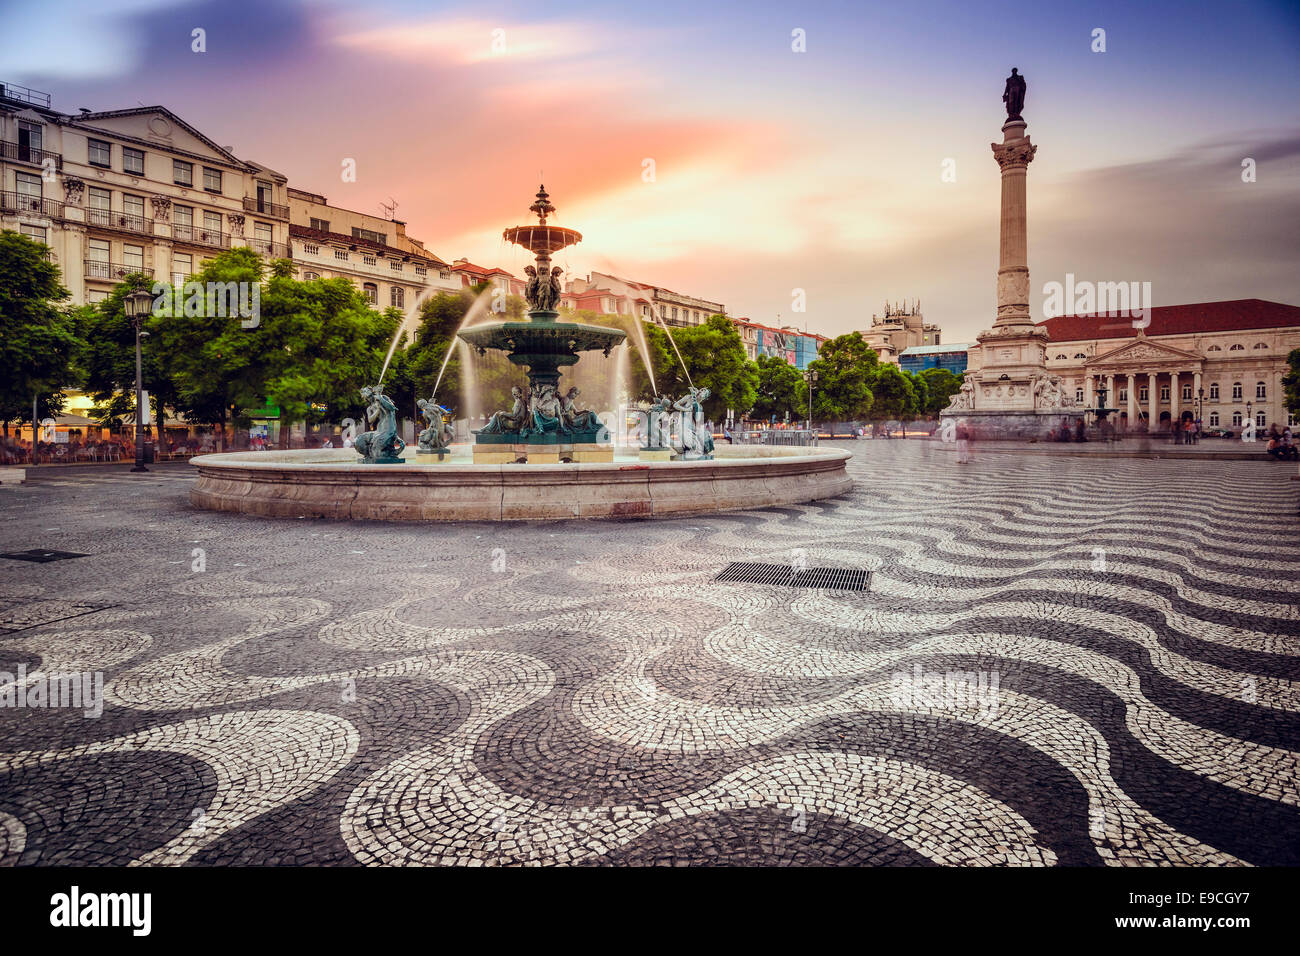 Lisbon, Portugal at Rossio Square. - Stock Image